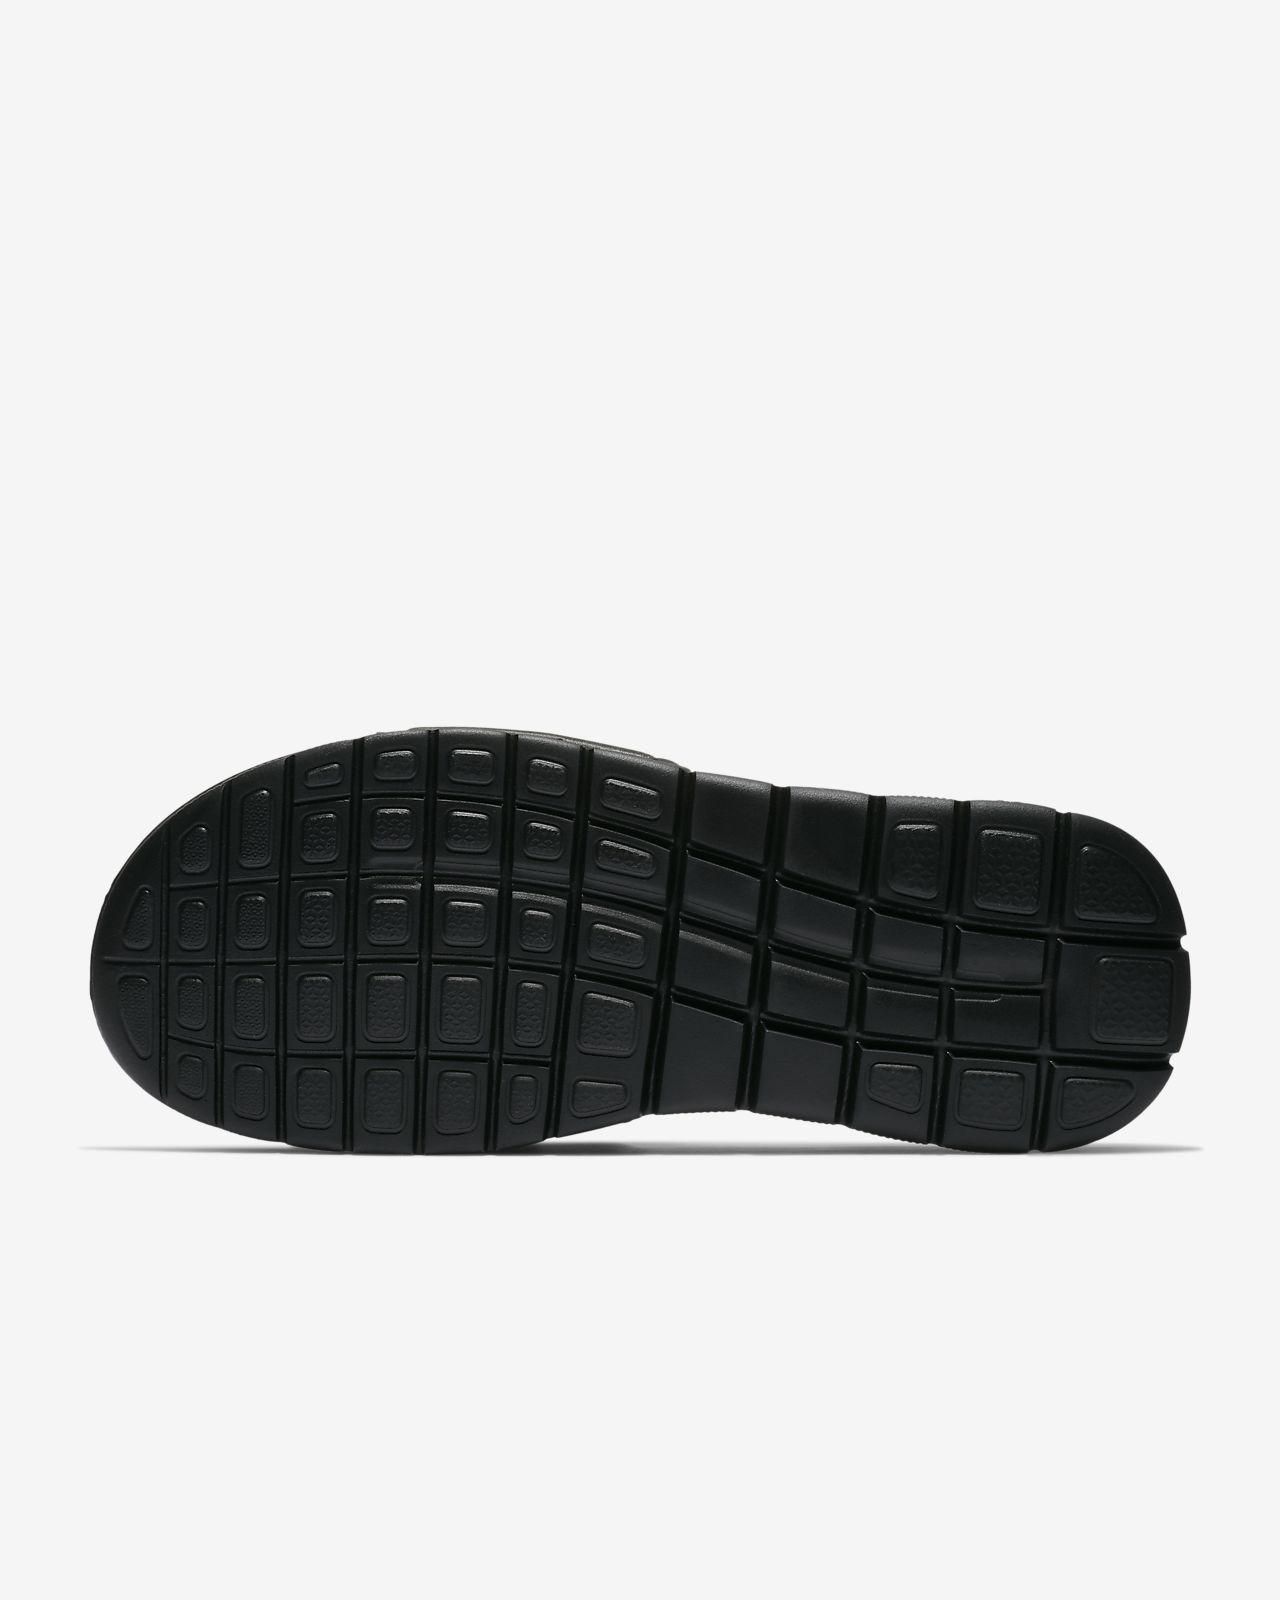 new arrive b8dca 3cb9f Klapki męskie Hurley Fusion Slide. Nike.com PL